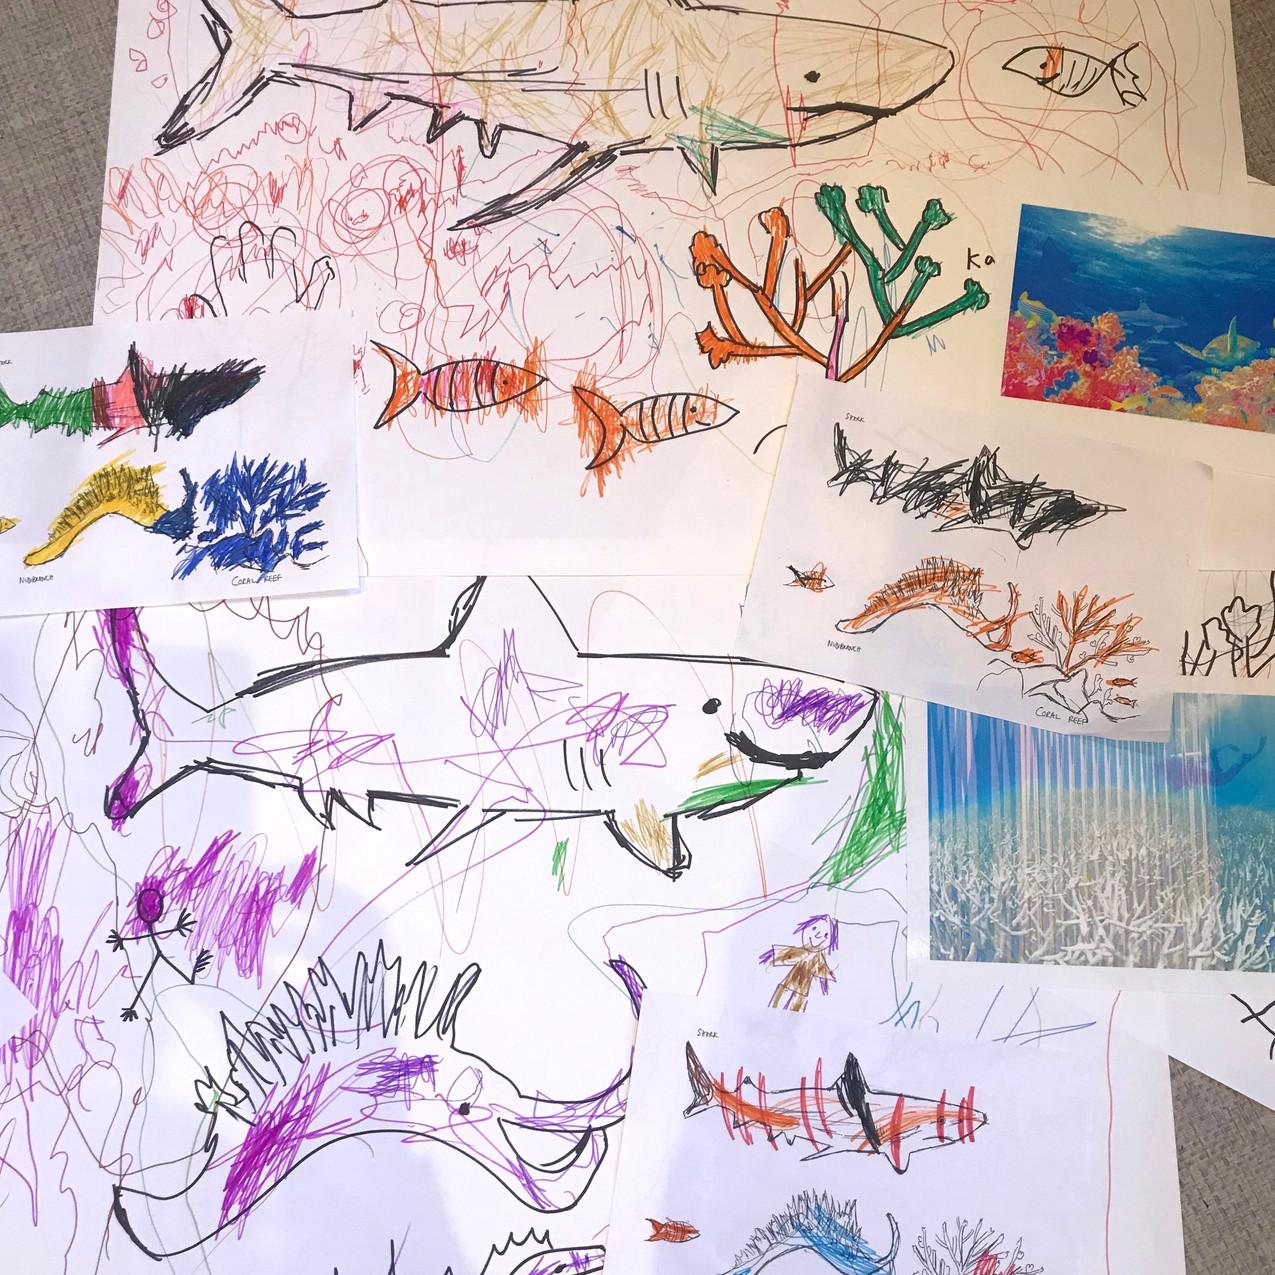 Coral Reef Conservation - Sharks & Nudib